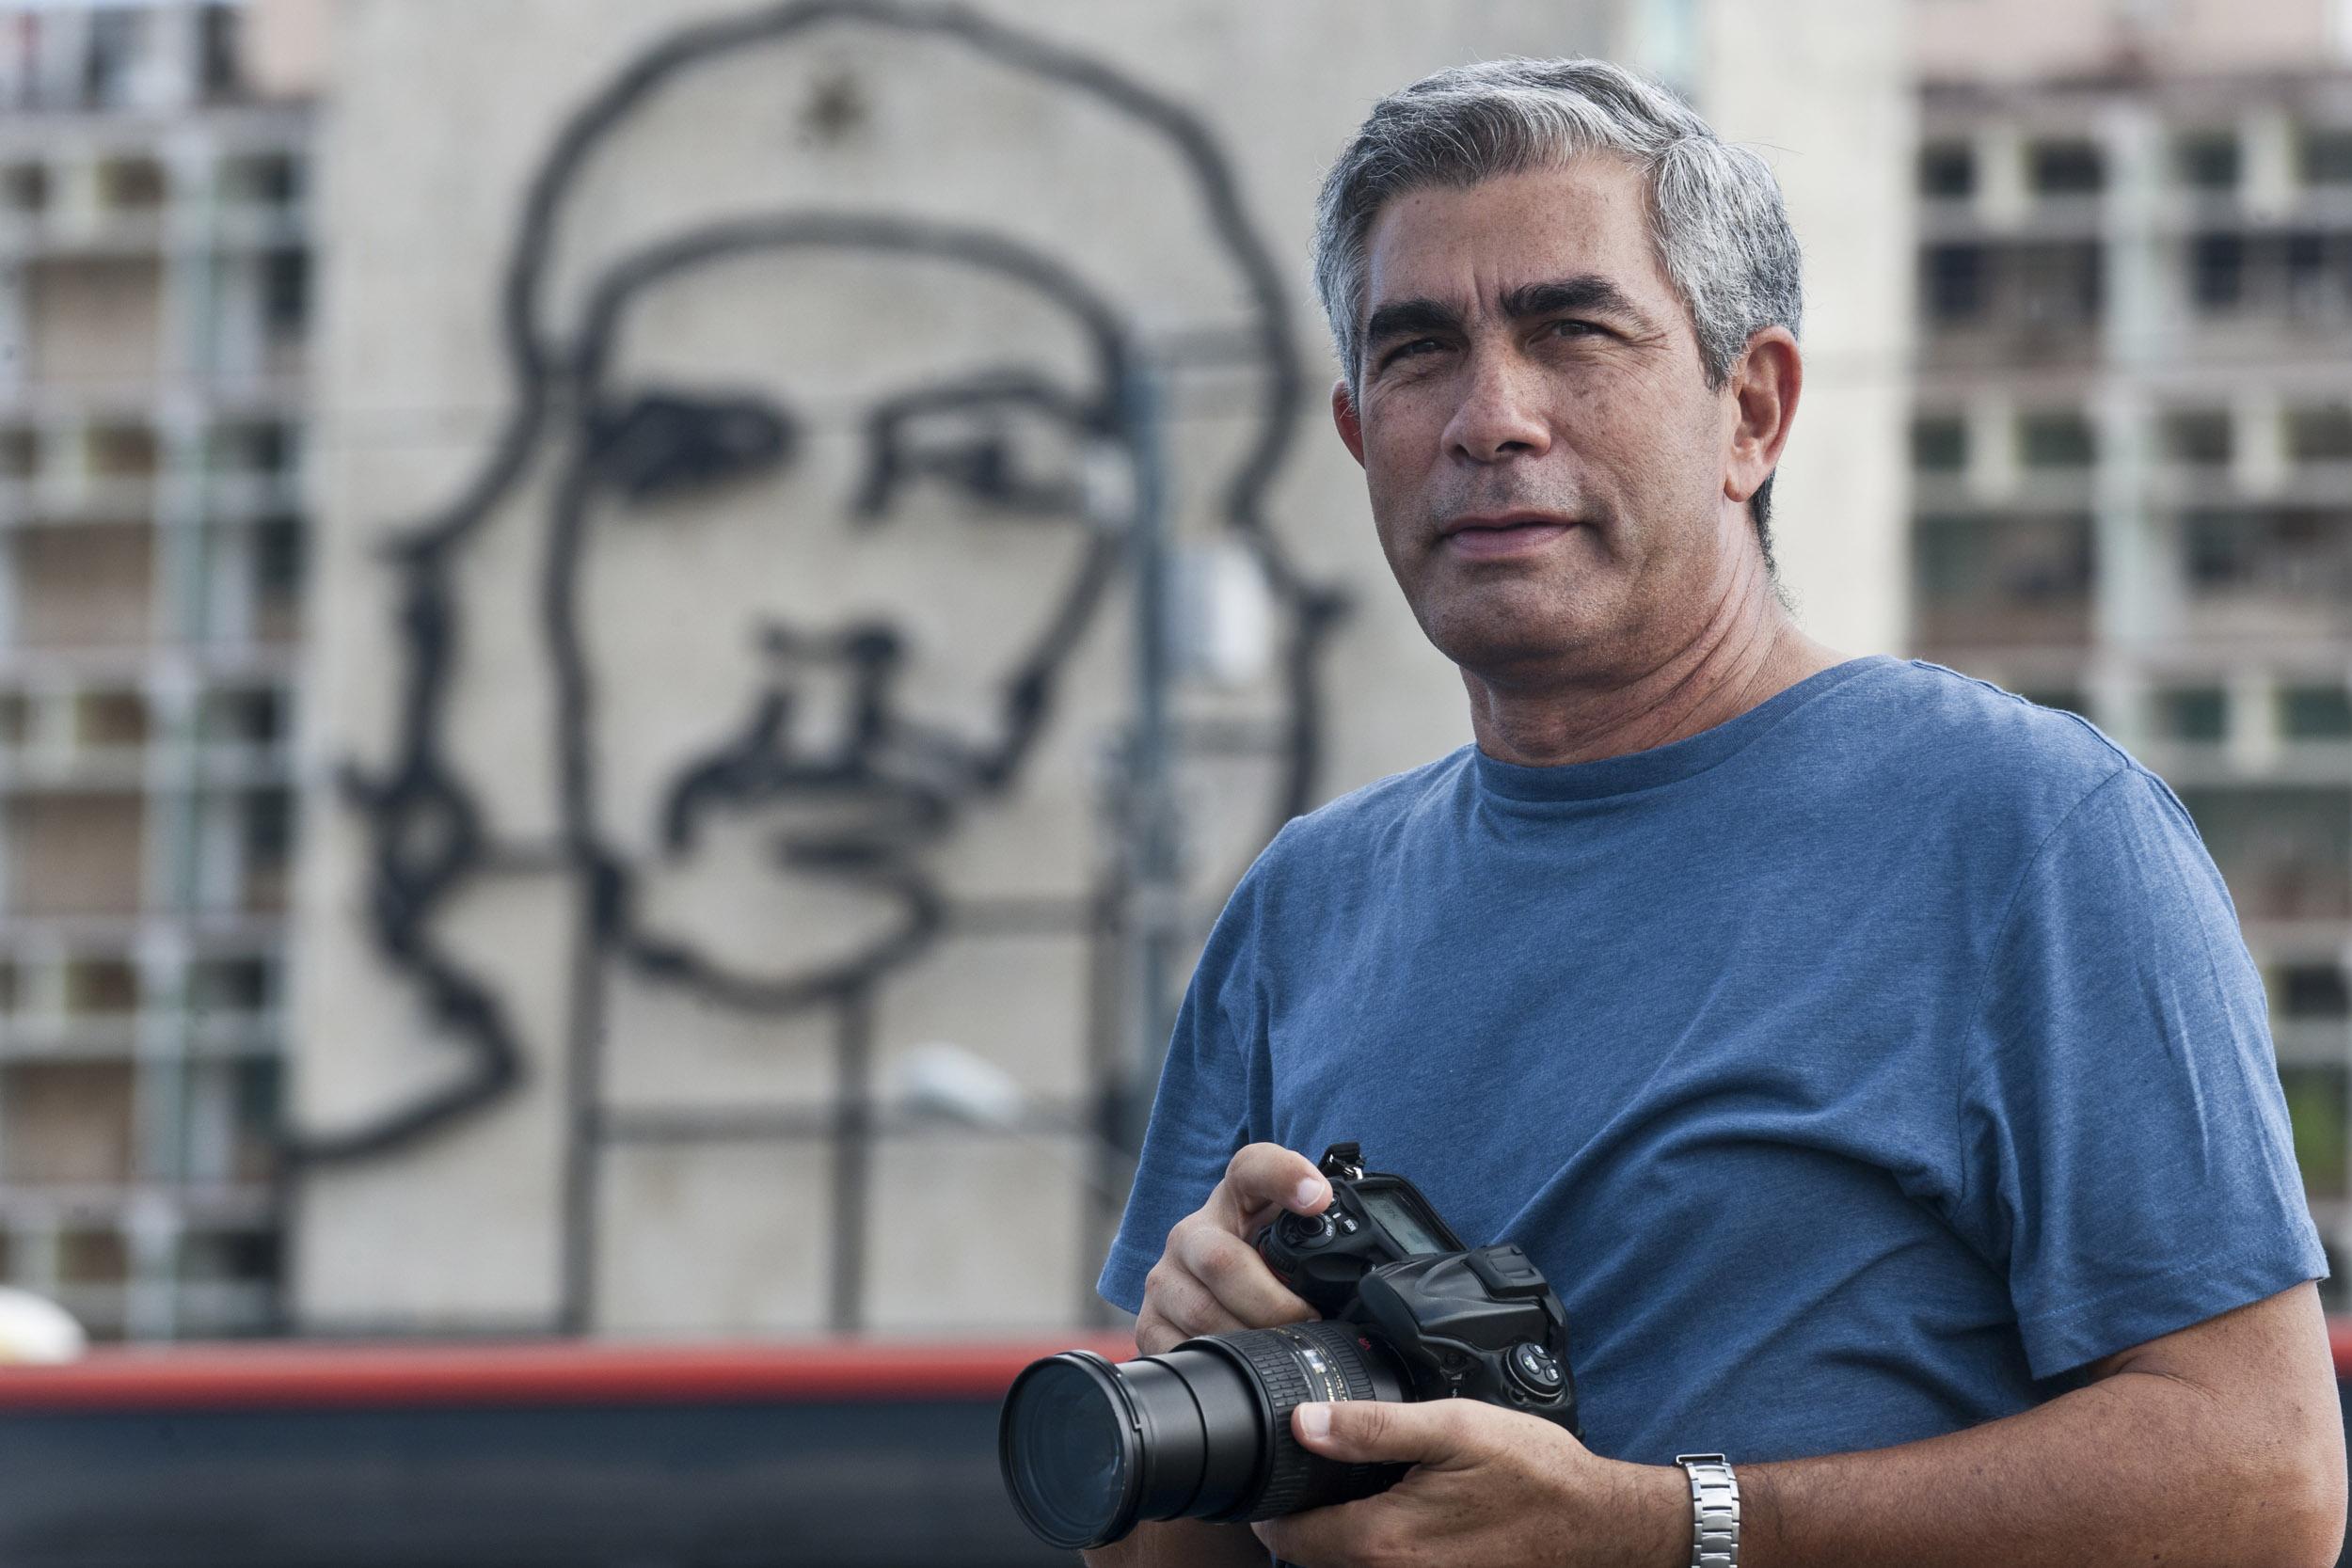 Julio Larramendi, photographer - Illuminated Cuba - Hector Garrido, Aerial and human photography